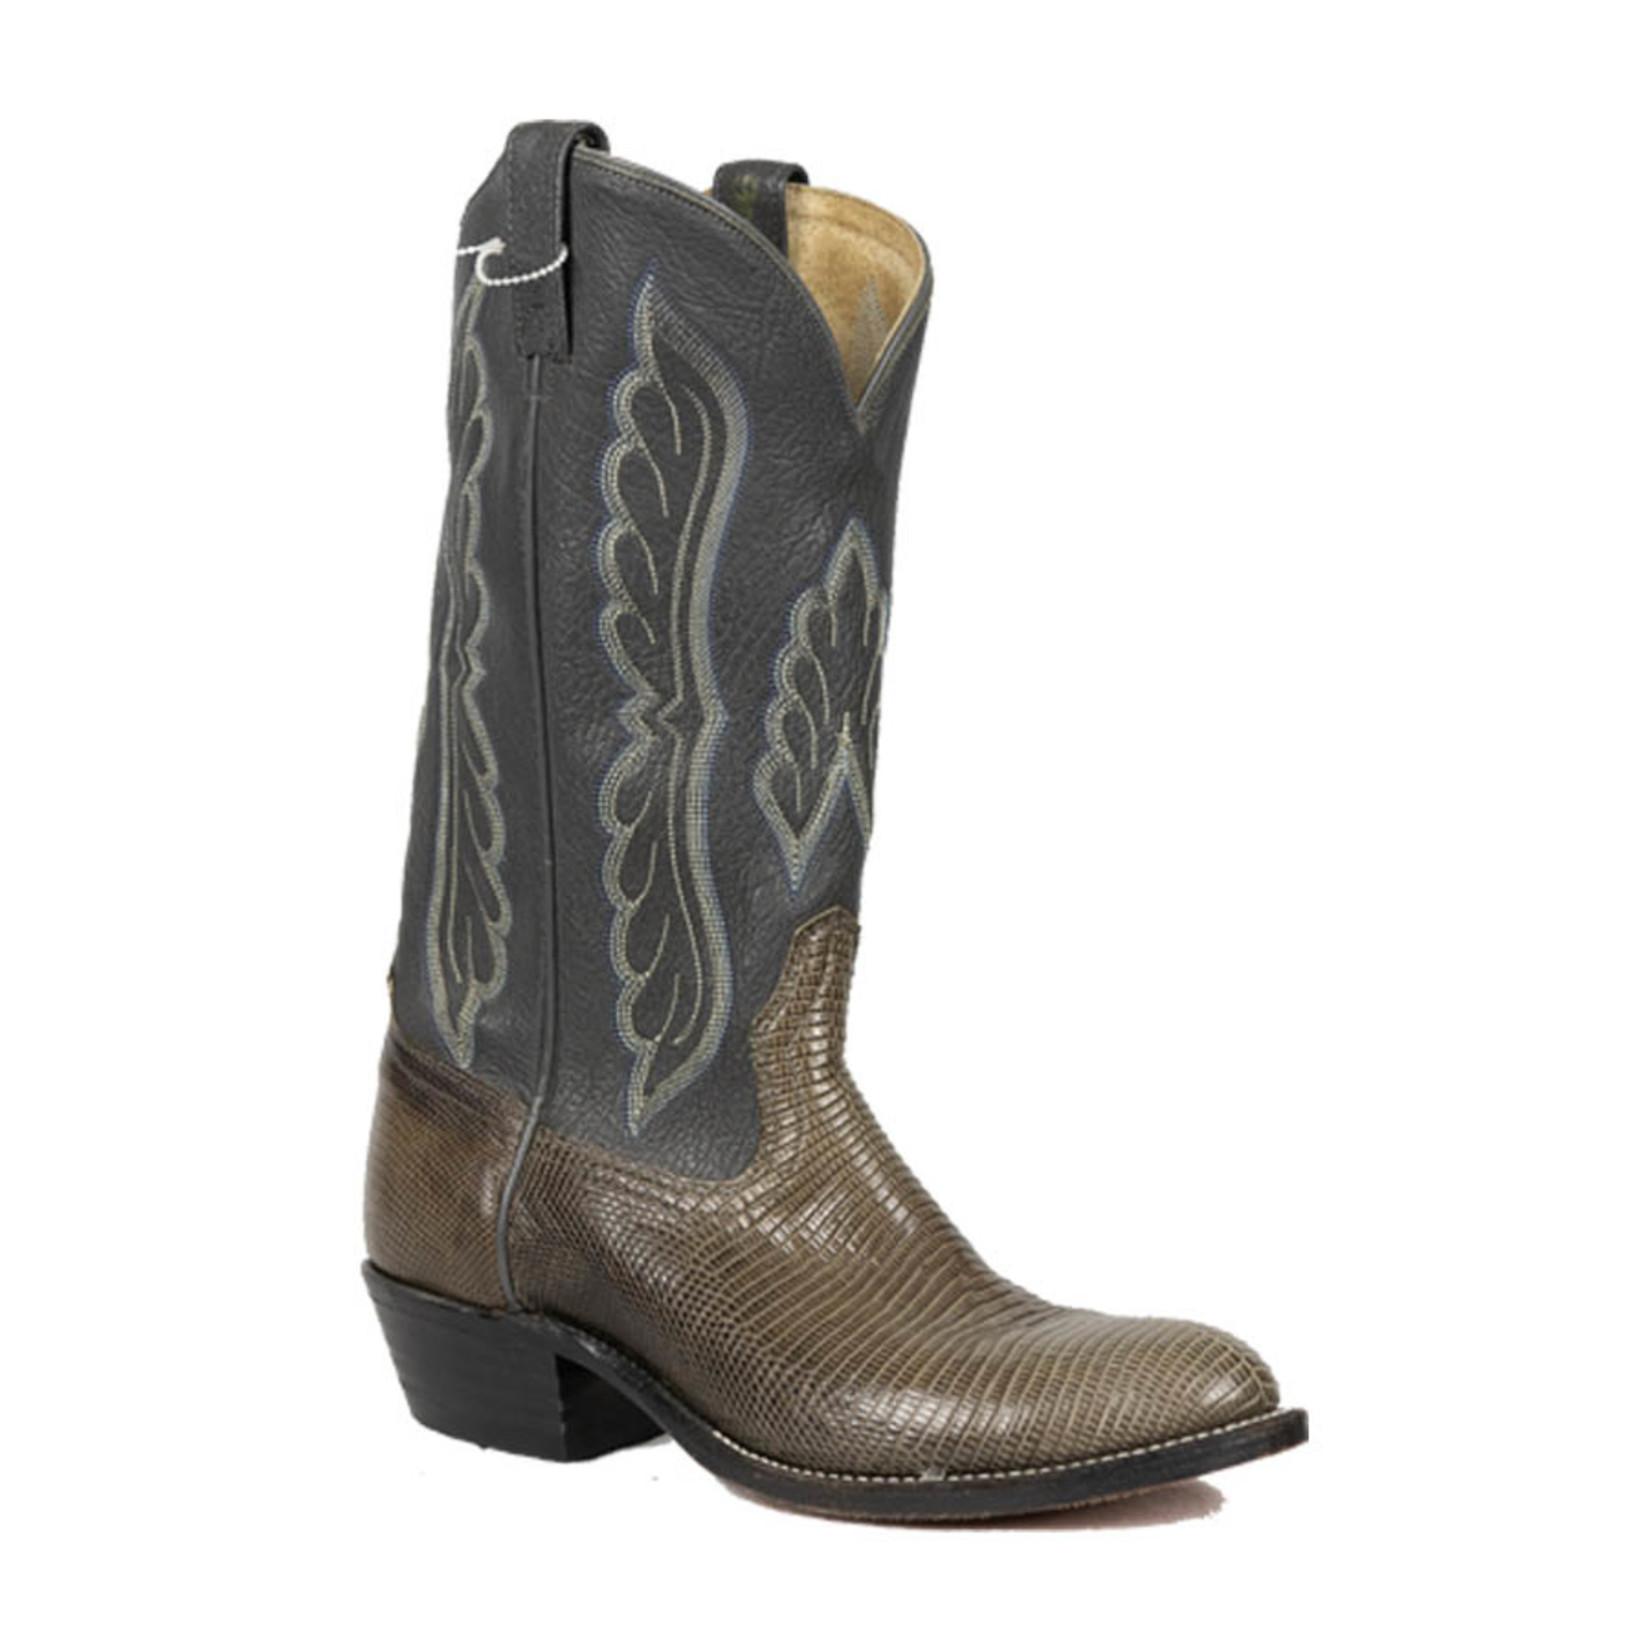 Canada West Canada West Men's Cowboy Boot  8104 E